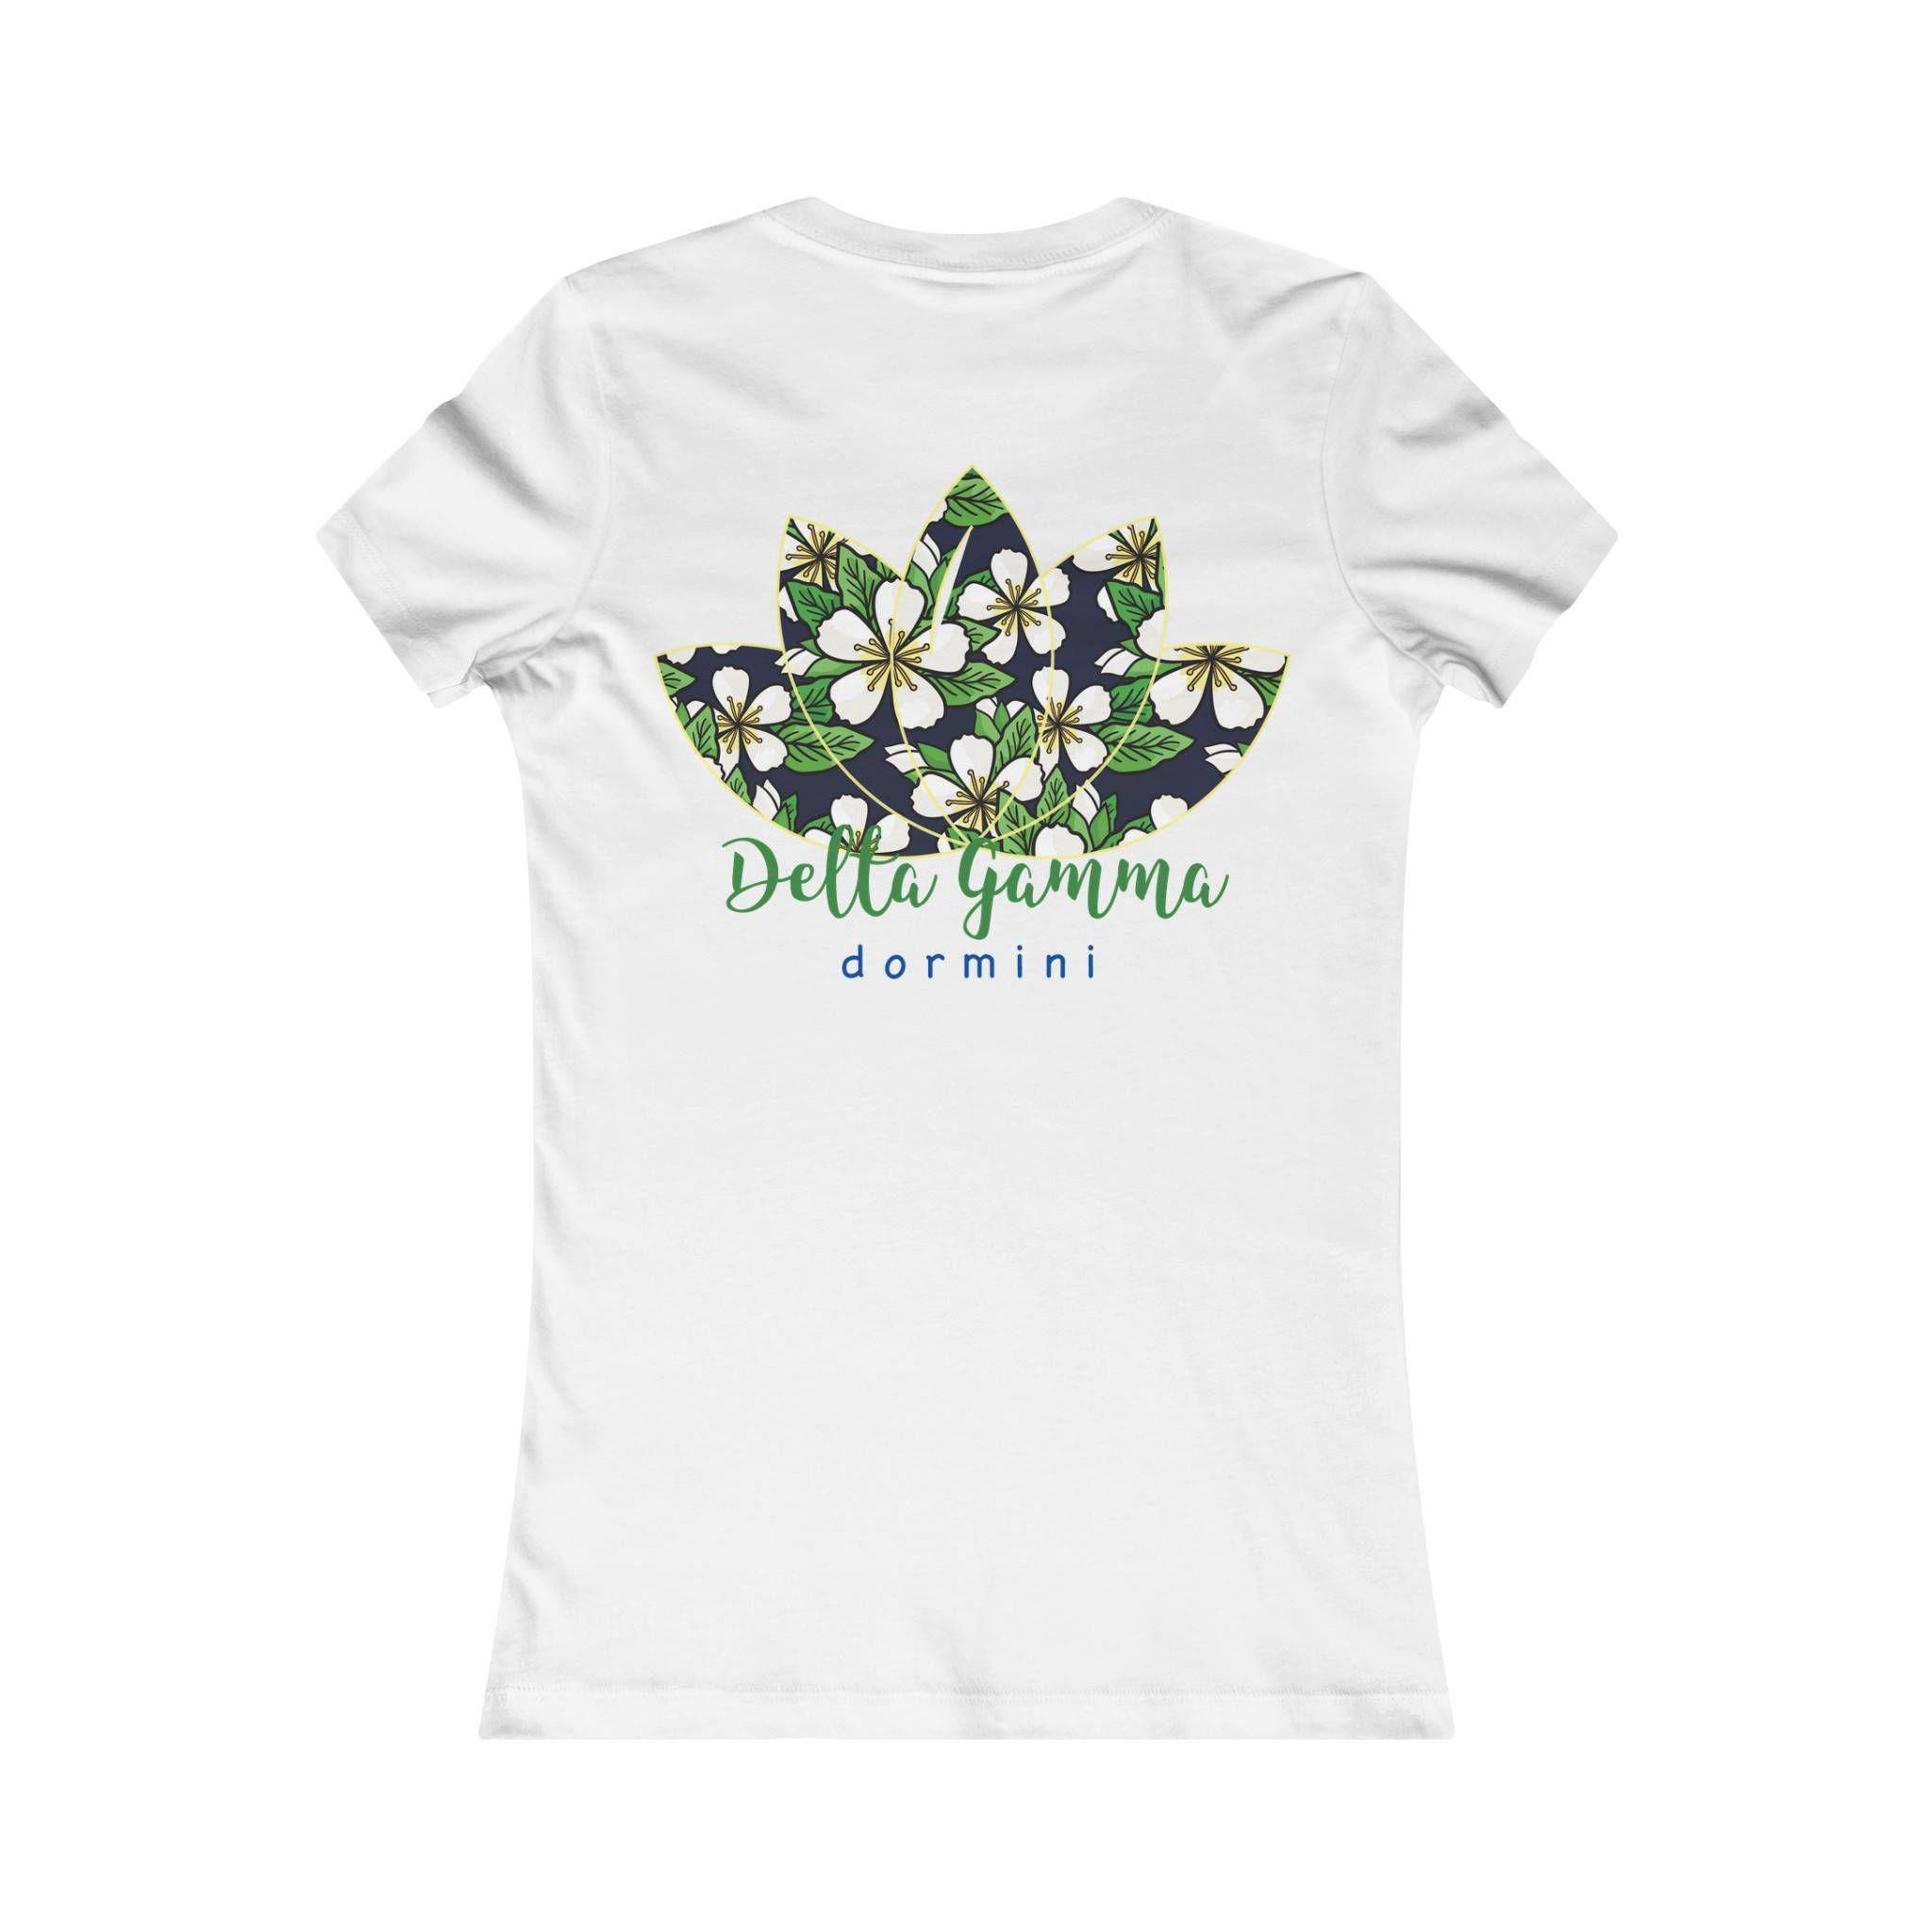 Delta gamma sorority lotus flower comfortable t shirt delta gamma delta gamma sorority lotus flower comfortable t shirt izmirmasajfo